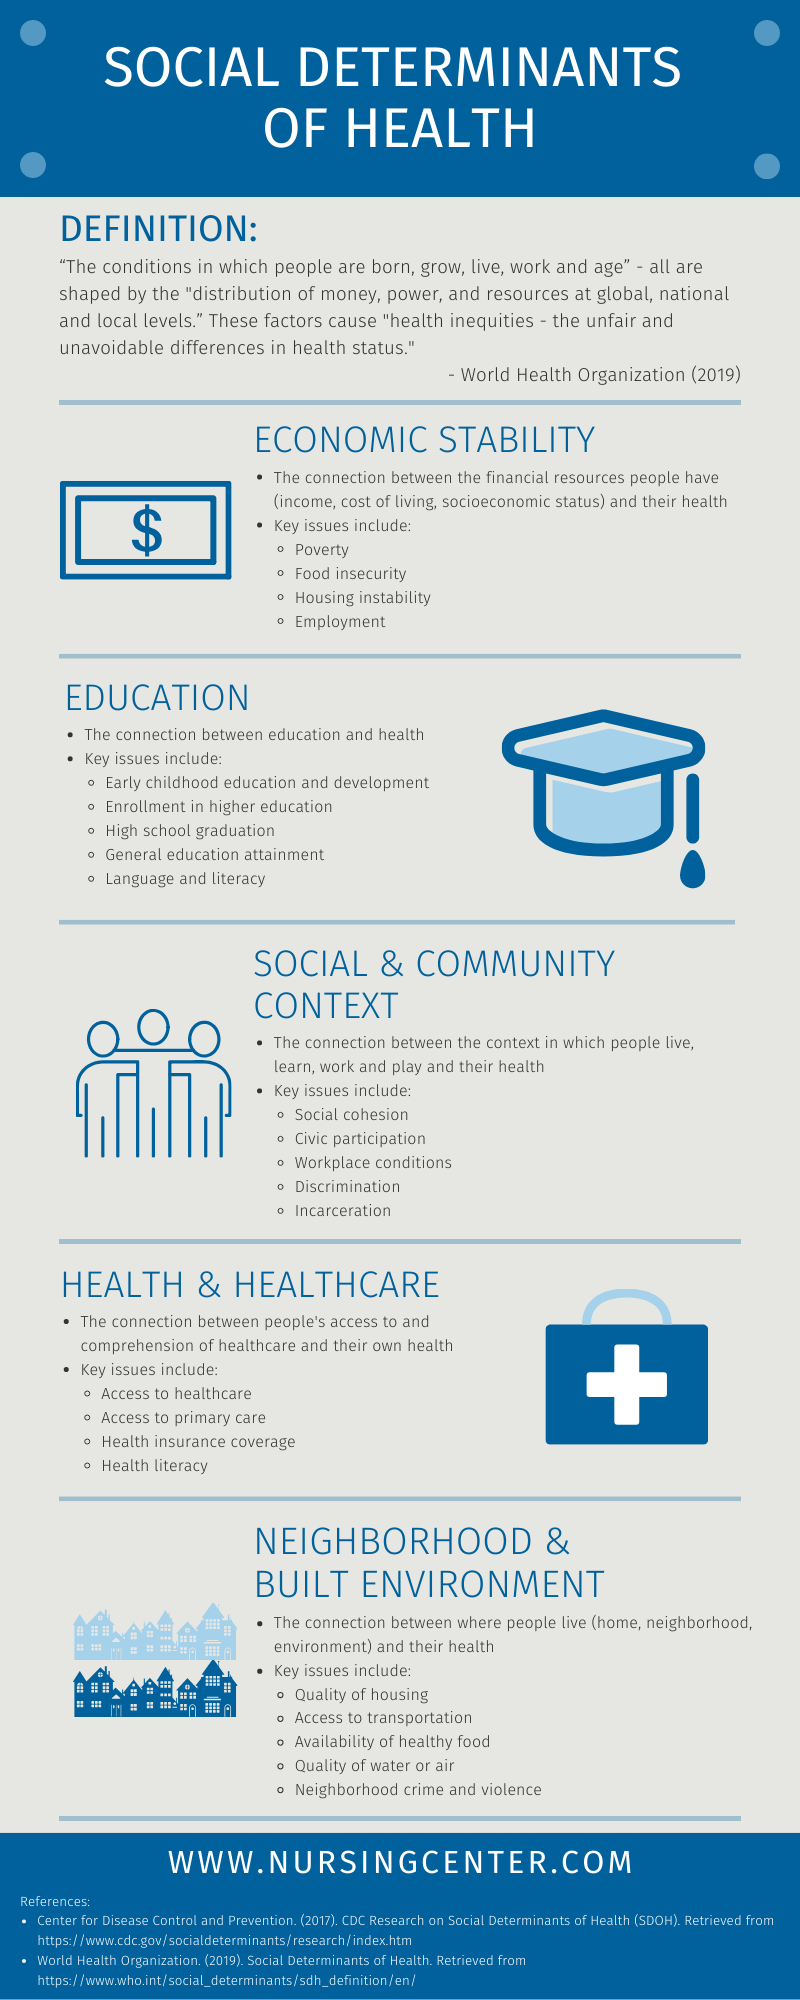 Addressing Social Determinants Of Health Lippincott Nursingcenter Social Determinants Of Health Medical Social Work Hospital Social Work